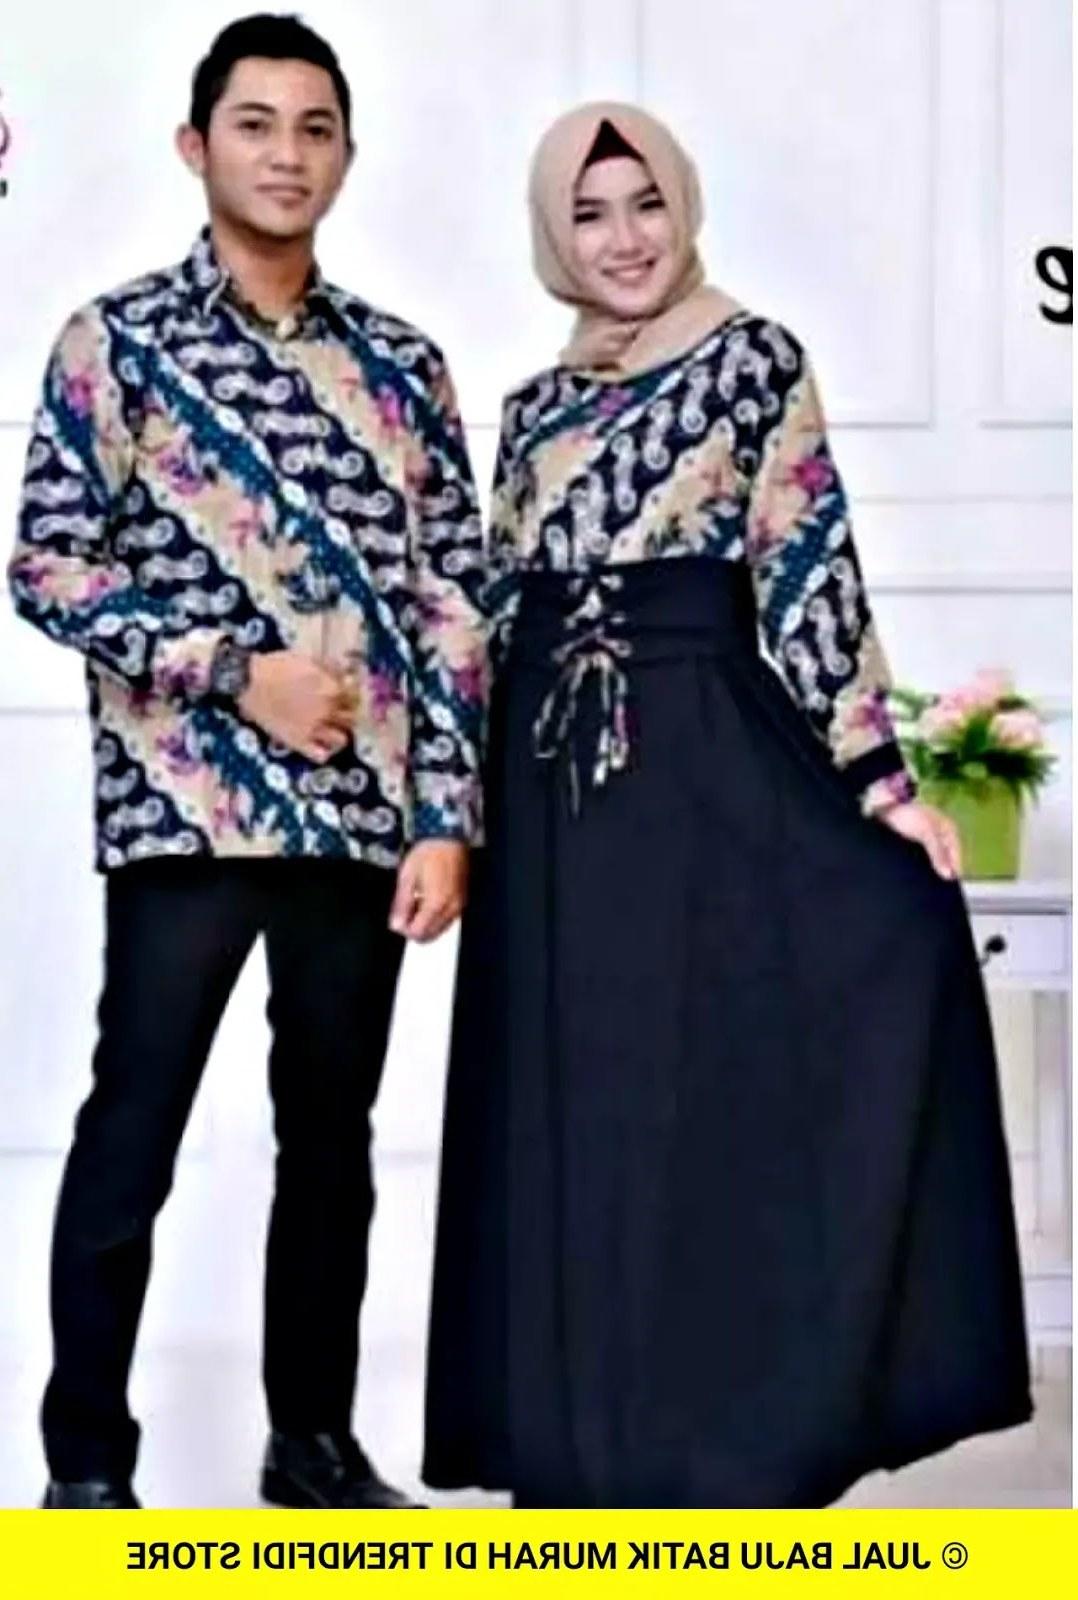 Model Model Baju Lebaran Thn 2020 Tqd3 30 Model Baju Batik Thn 2020 Fashion Modern Dan Terbaru